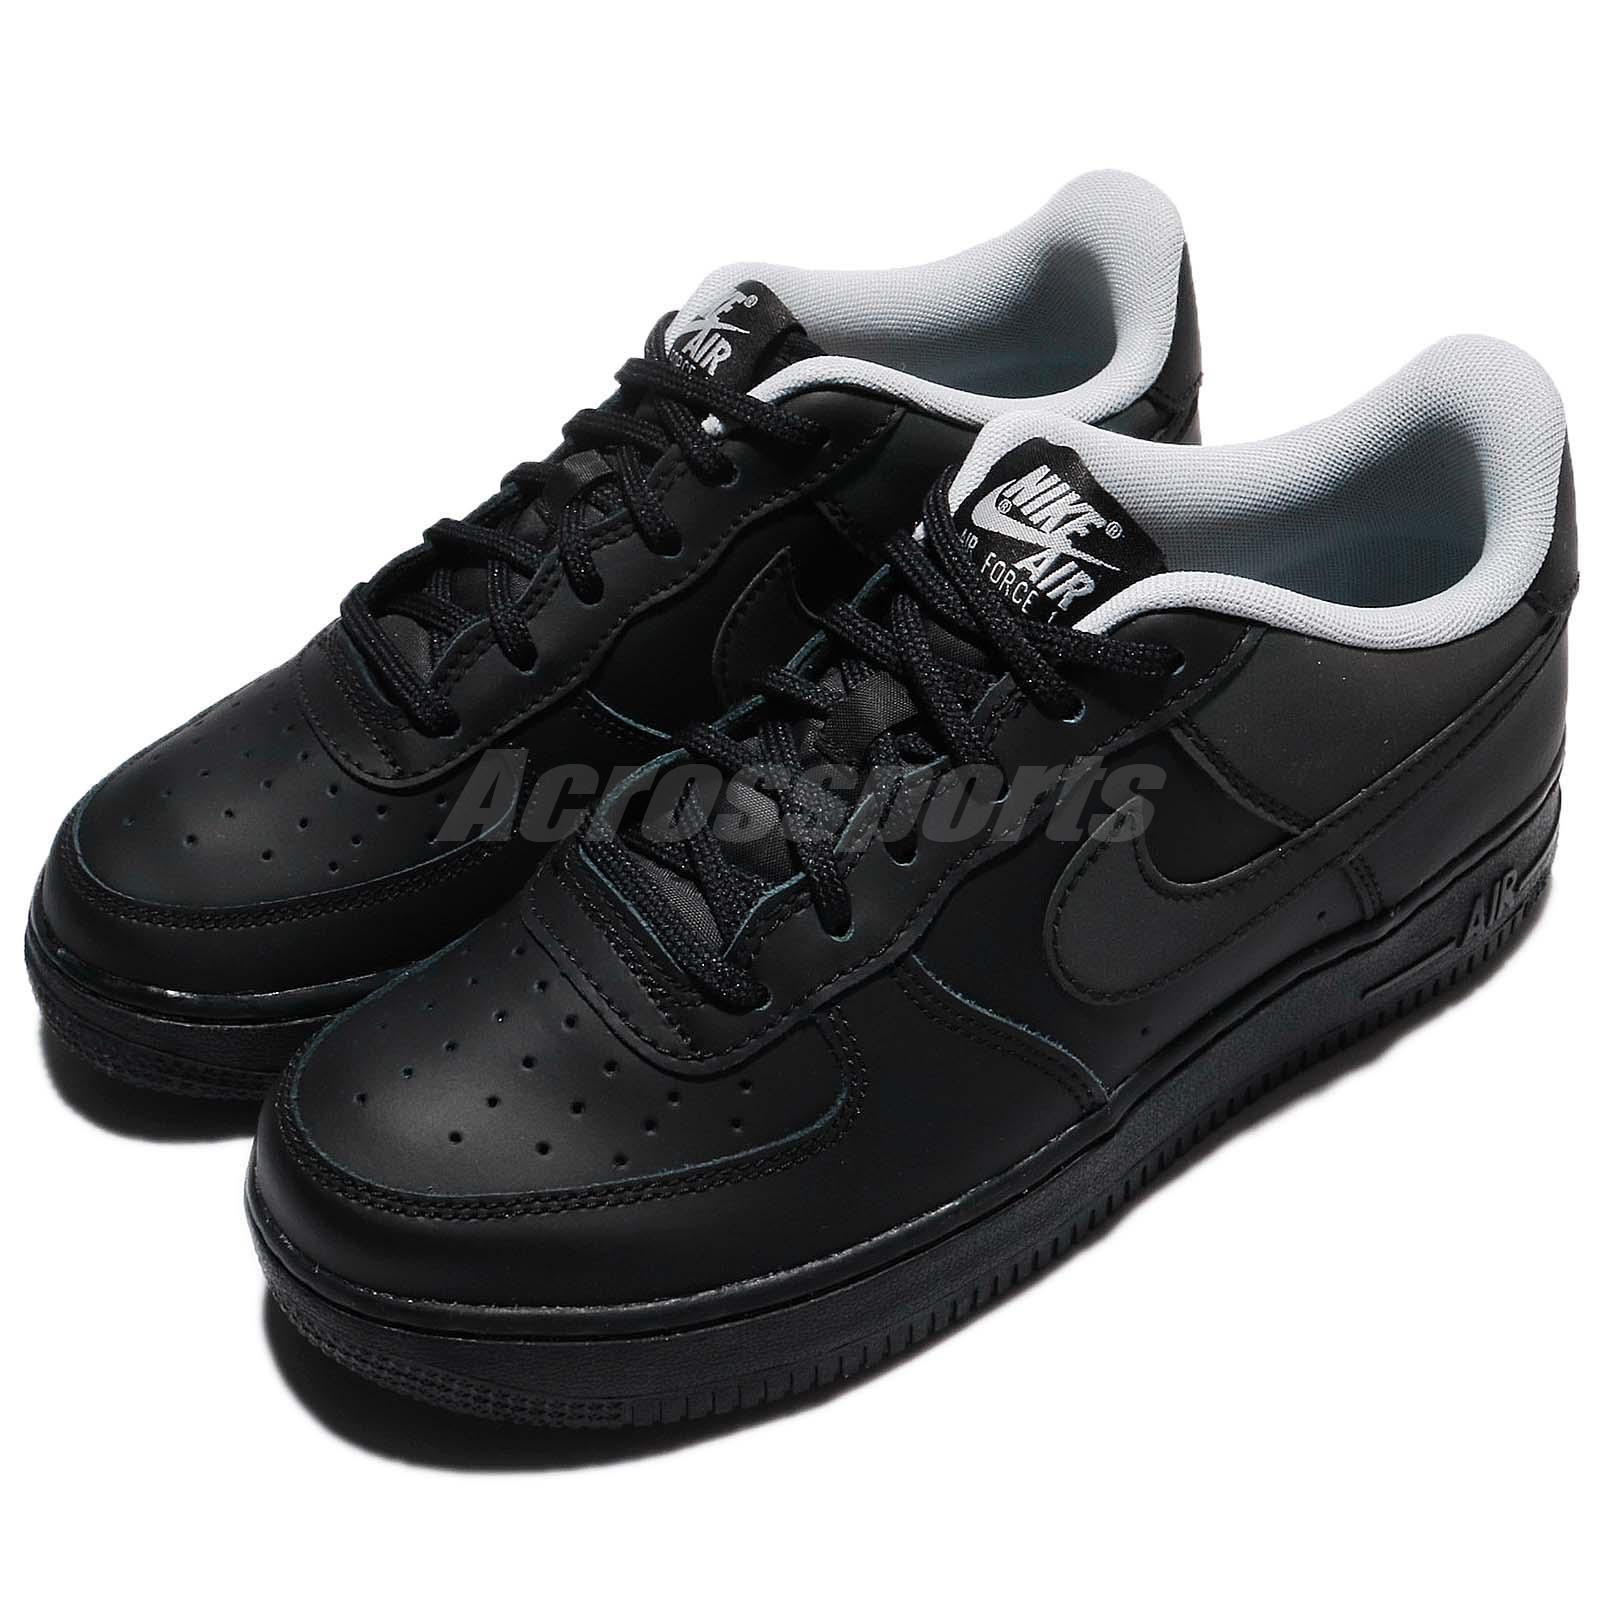 67efcd357393 Details about Nike Air Force 1 LV8 GS Reflective Black AF1 Kids Women Shoes  Sneaker 820438-009